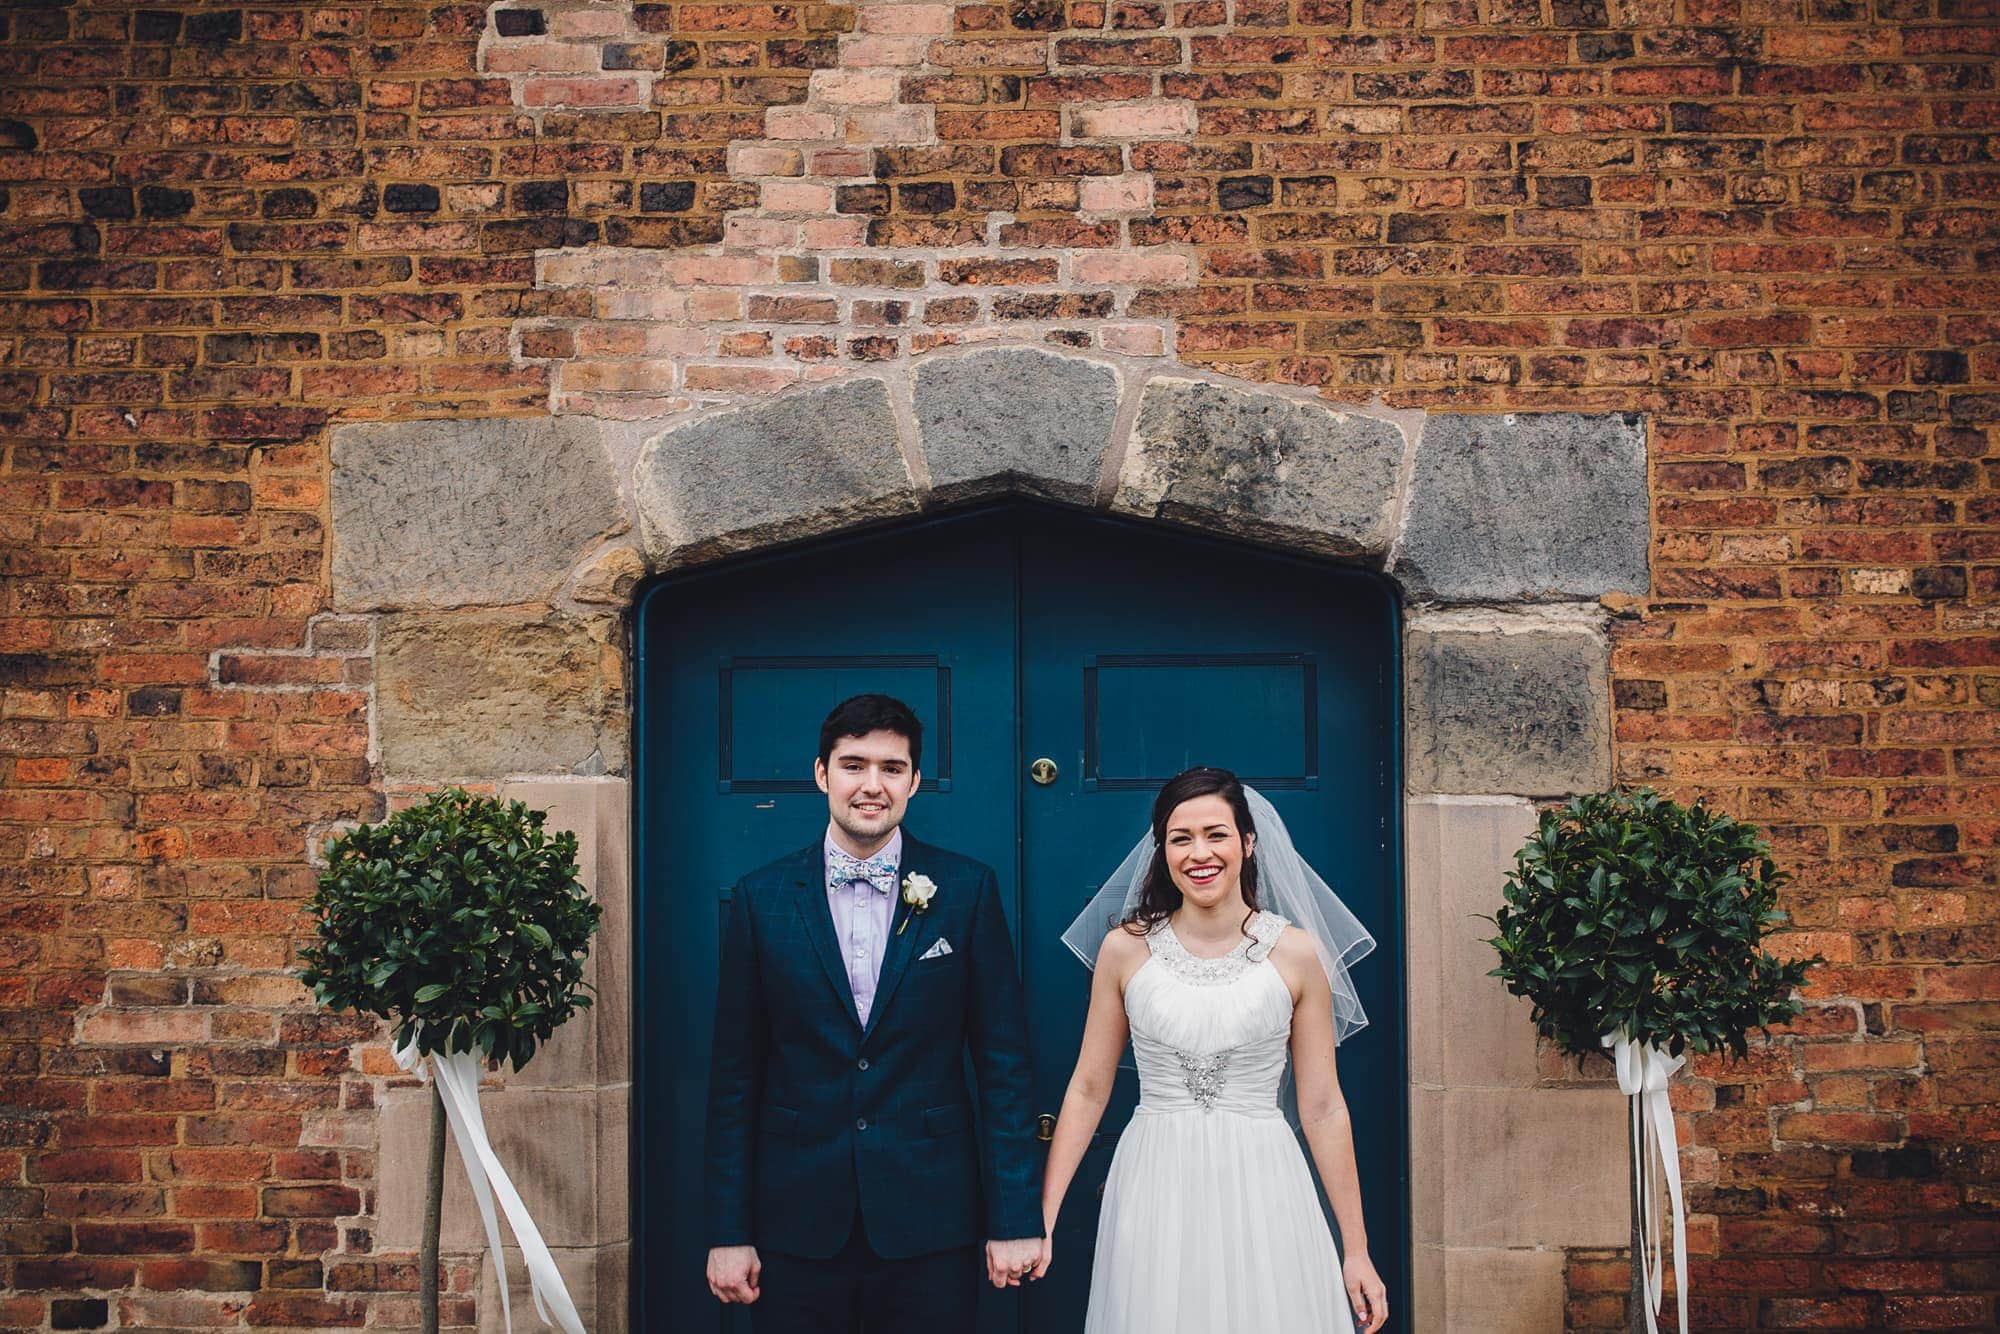 Matlt-Cross-Nottingham-wedding-Photography-33